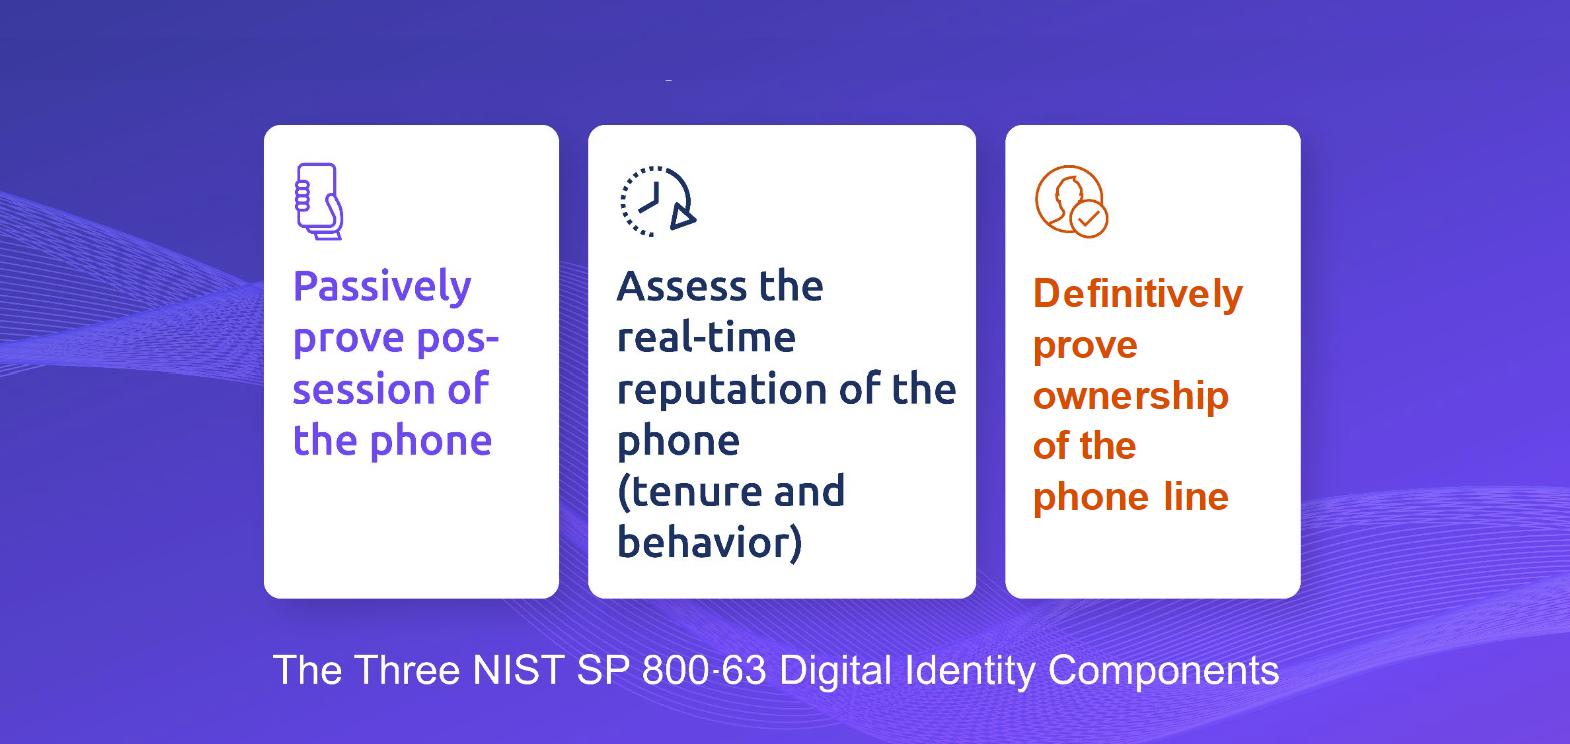 PRO Model of Identity Authentication and Verificationa